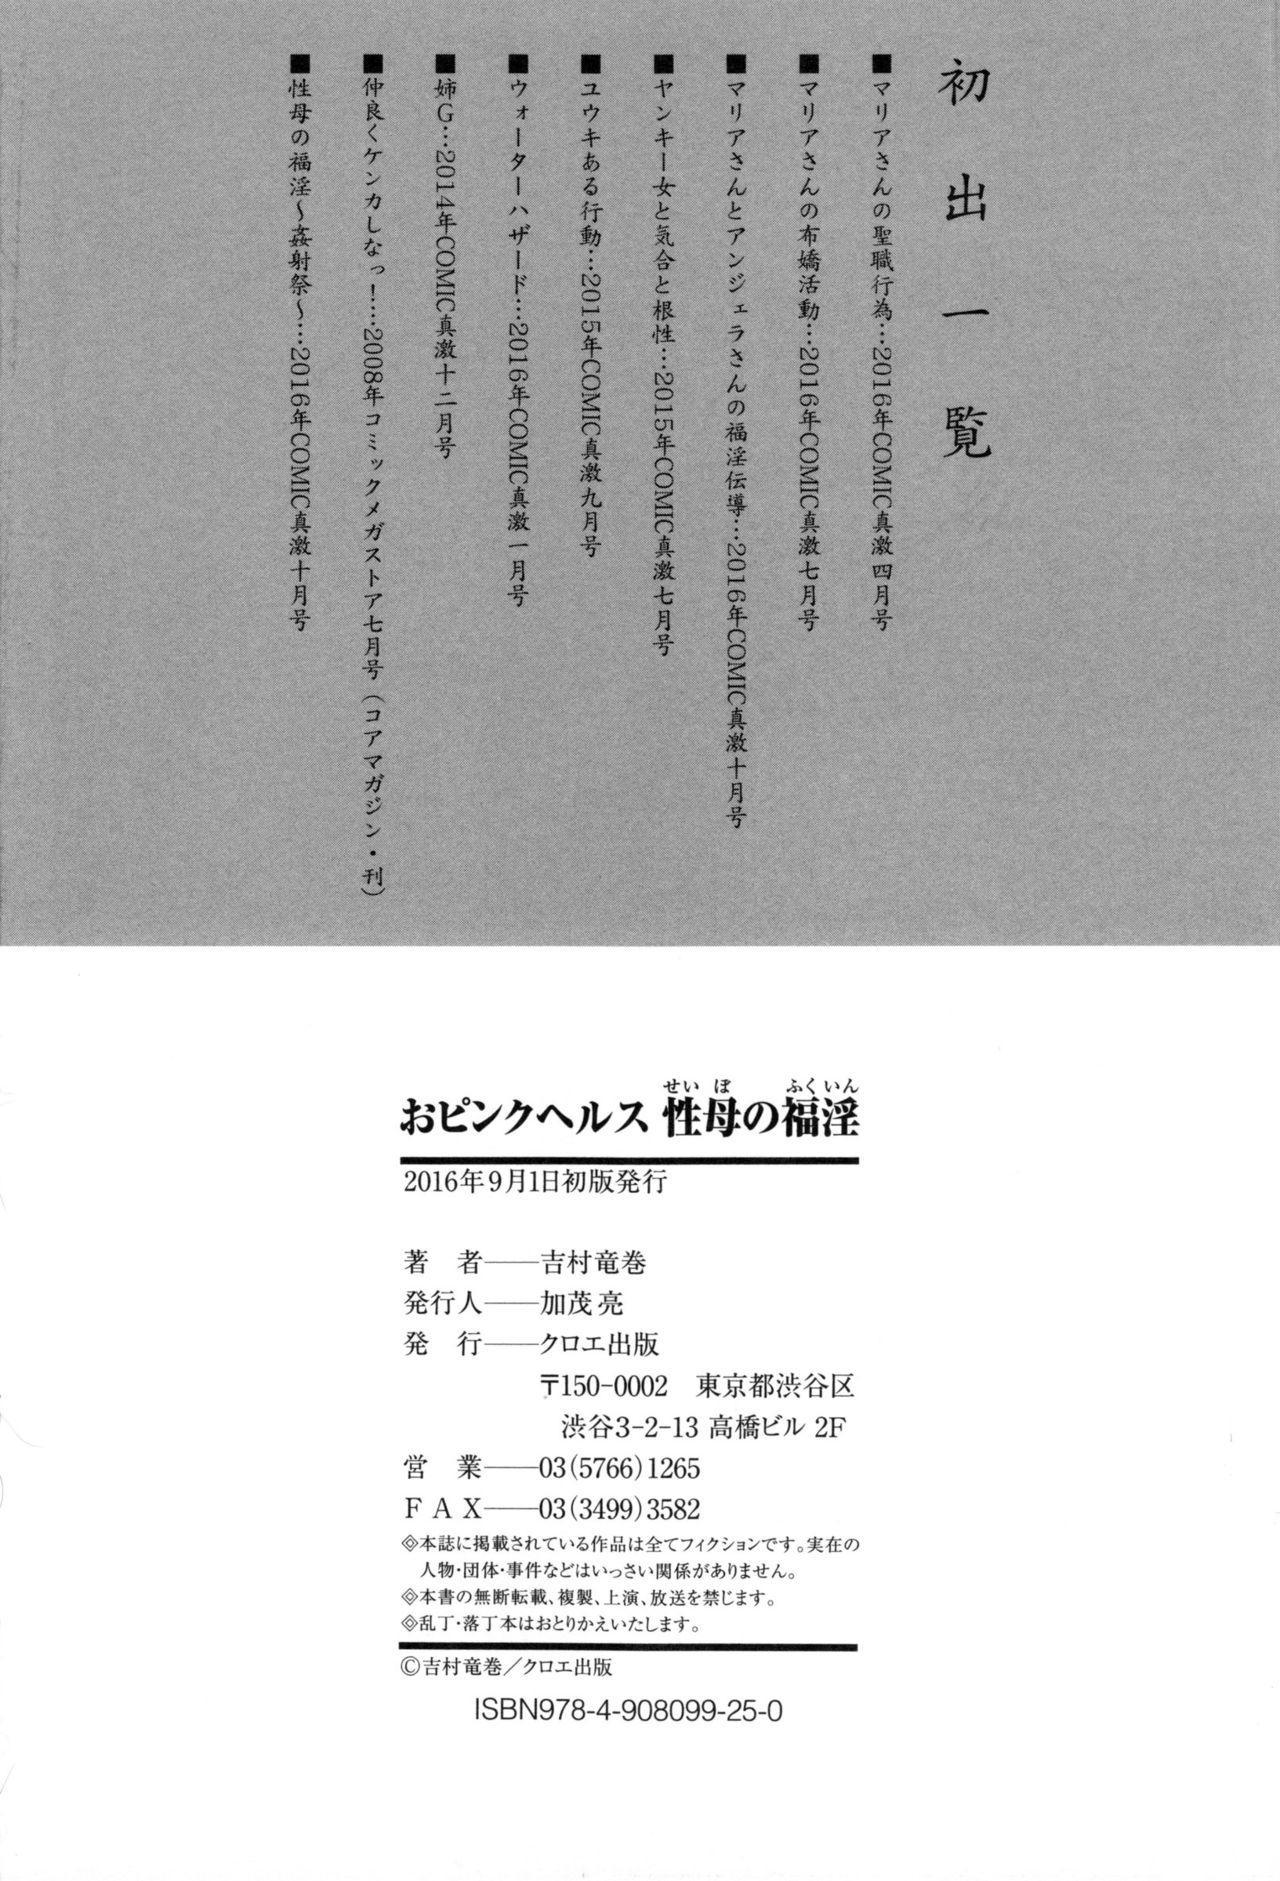 Opink Health Seibo no Fukuin 226